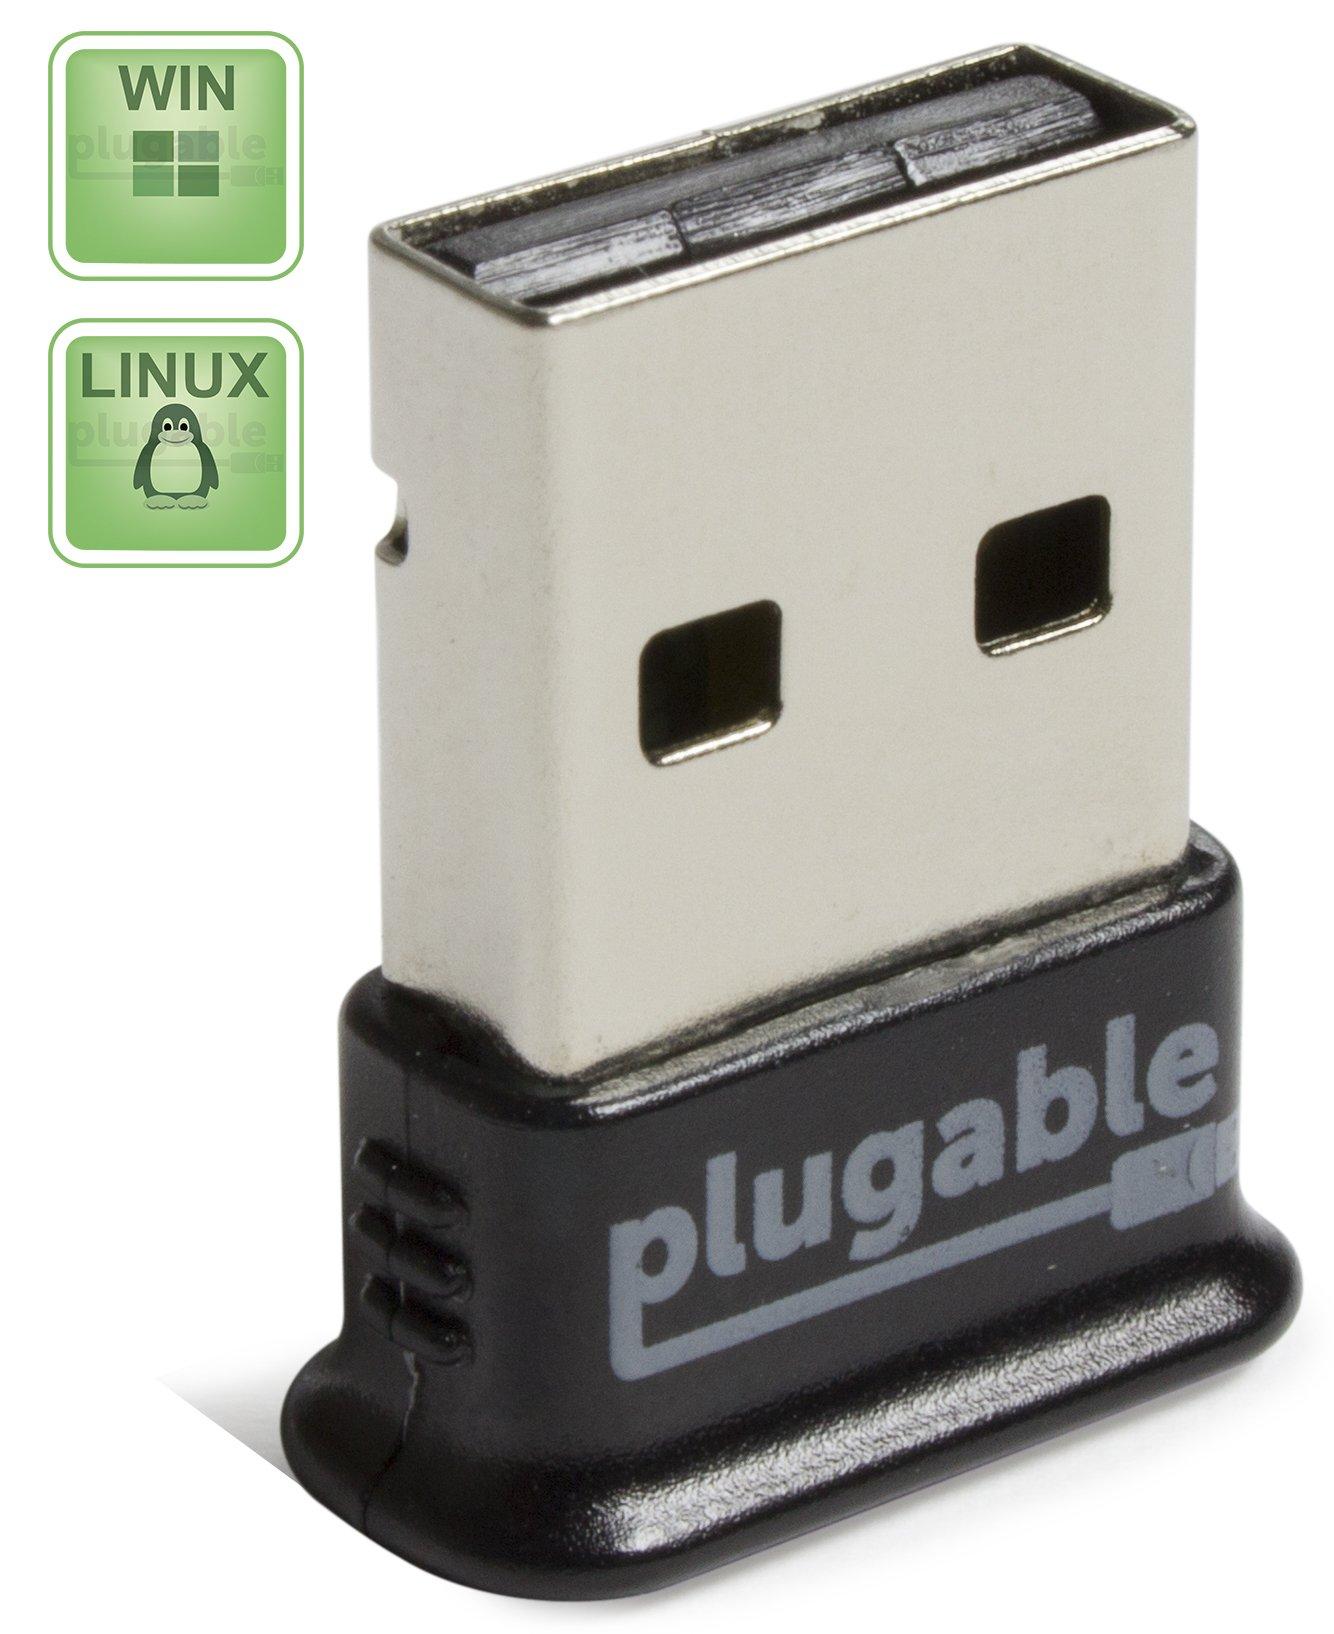 Plugable USB Bluetooth 4.0 Low Energy Micro Adapter (Windows 10 8.1 8 7 Raspb